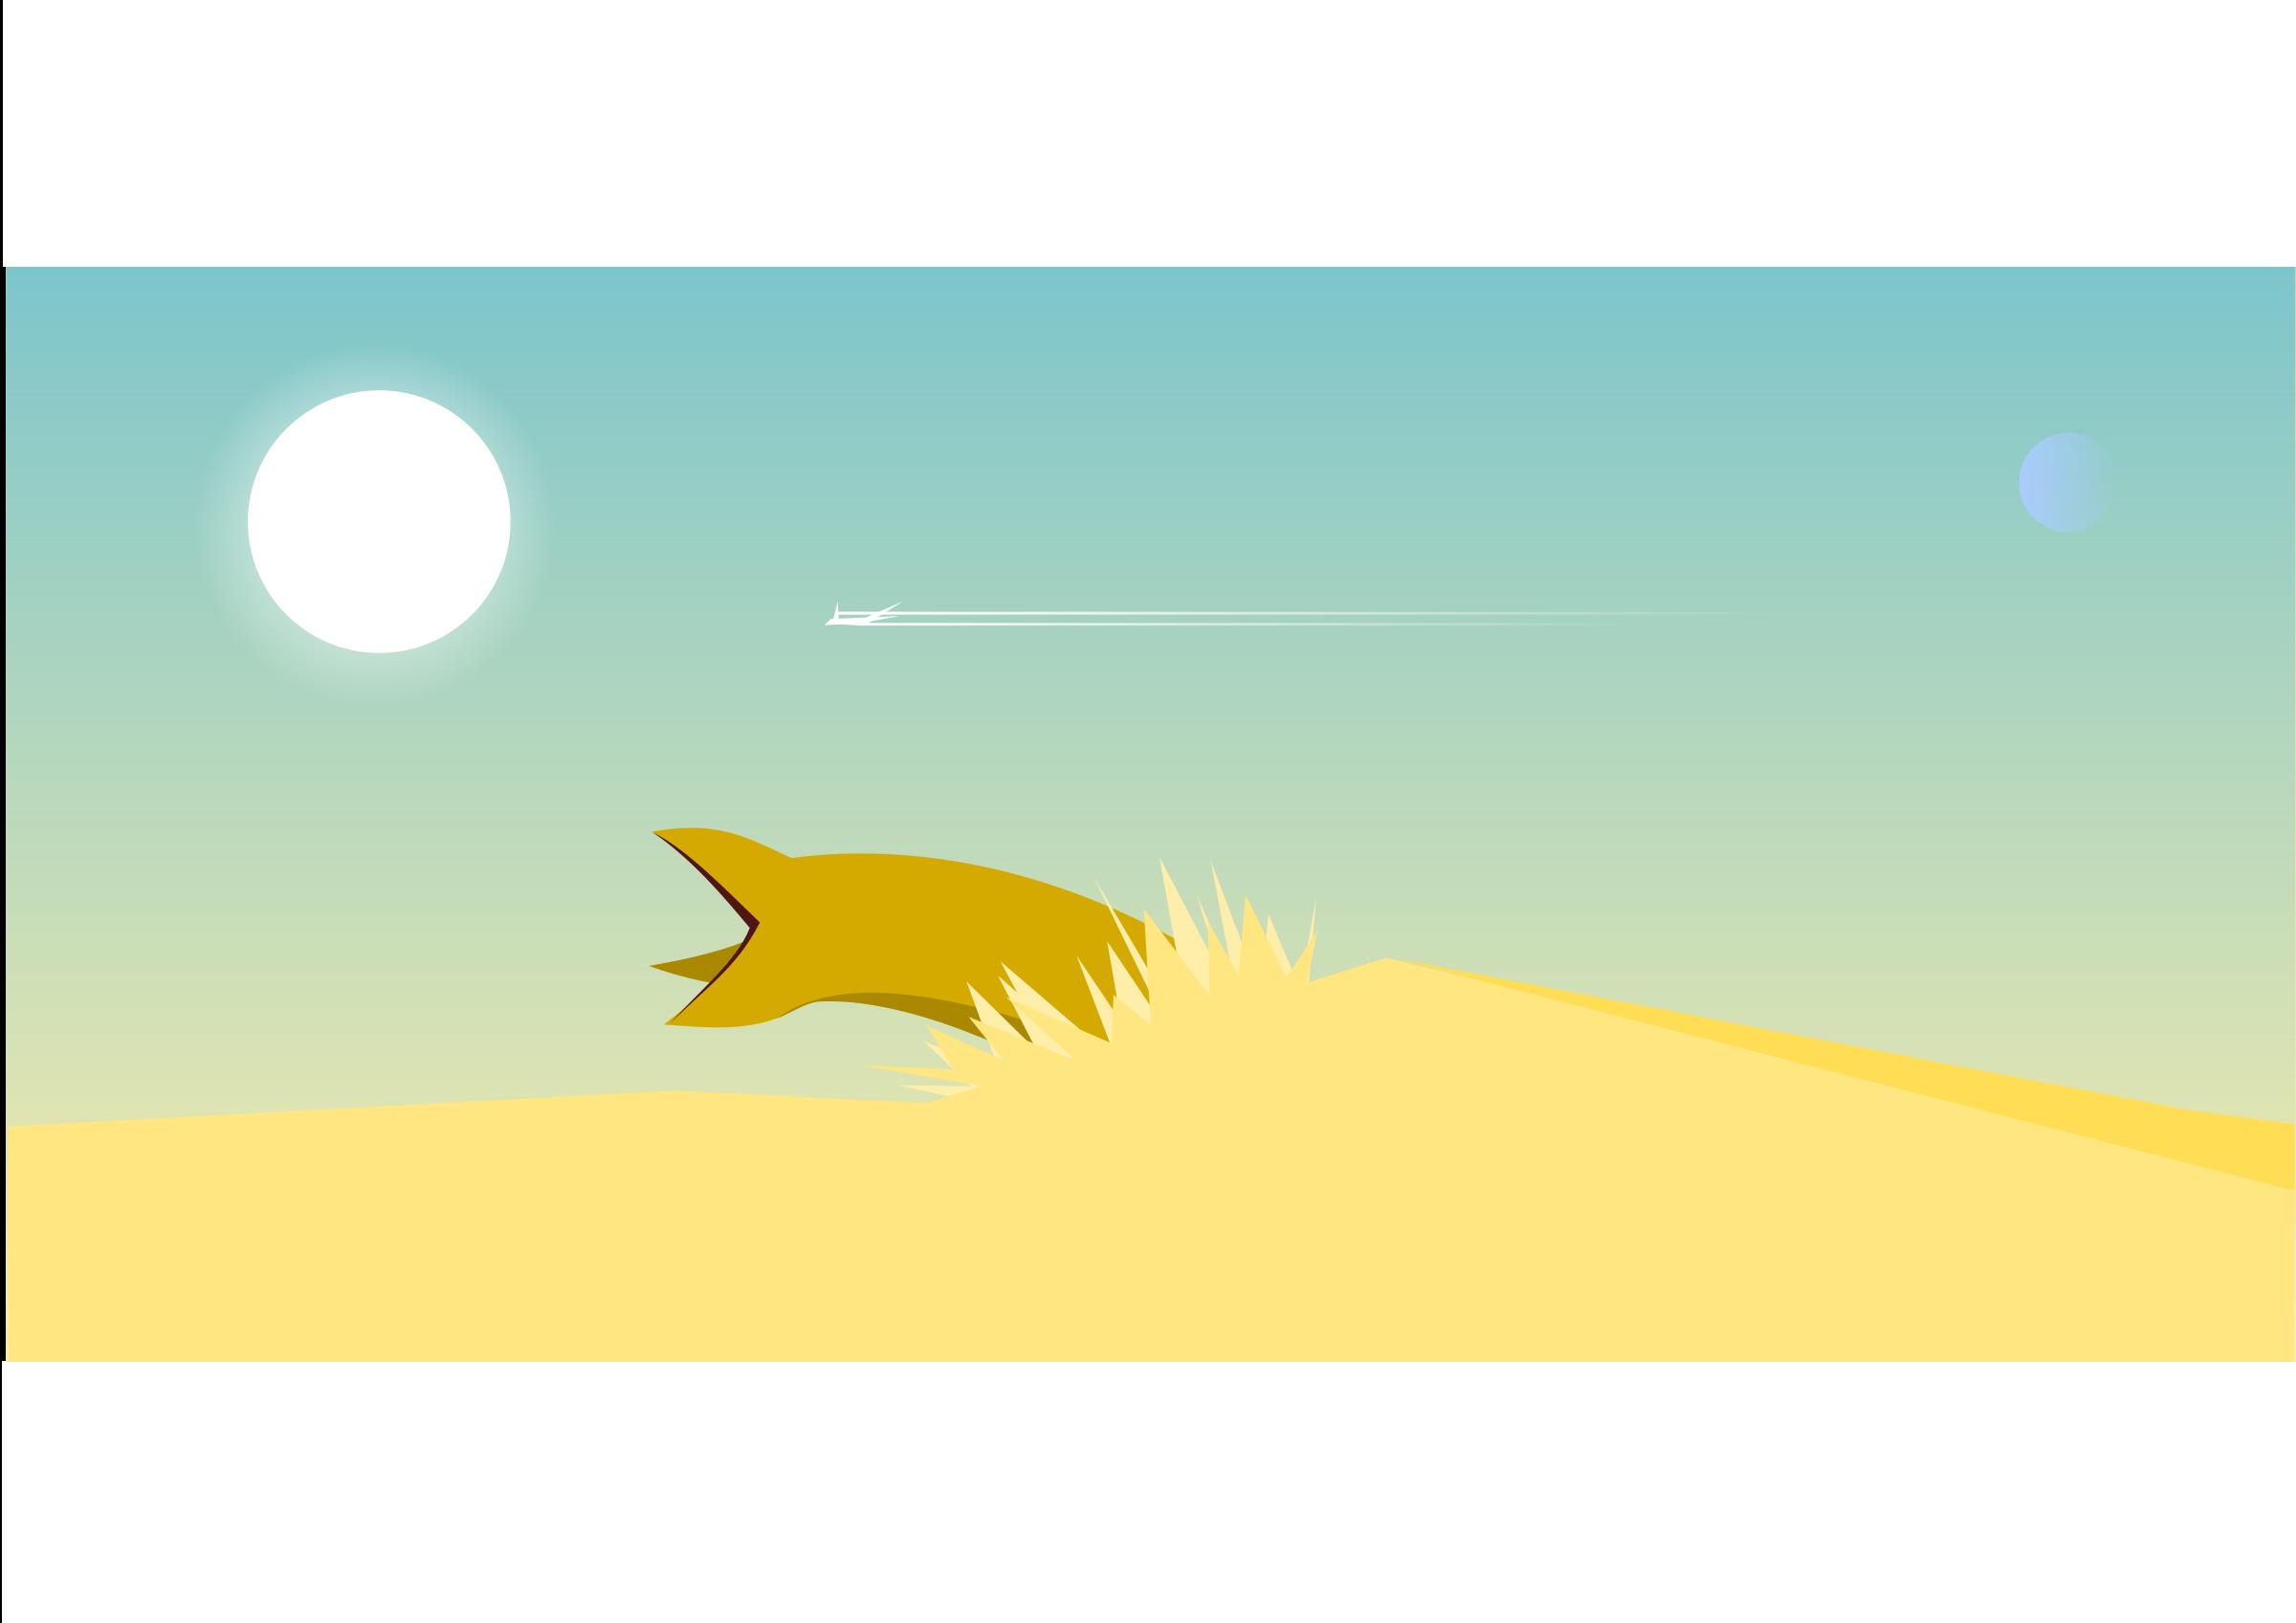 Dune clipart #3, Download drawings